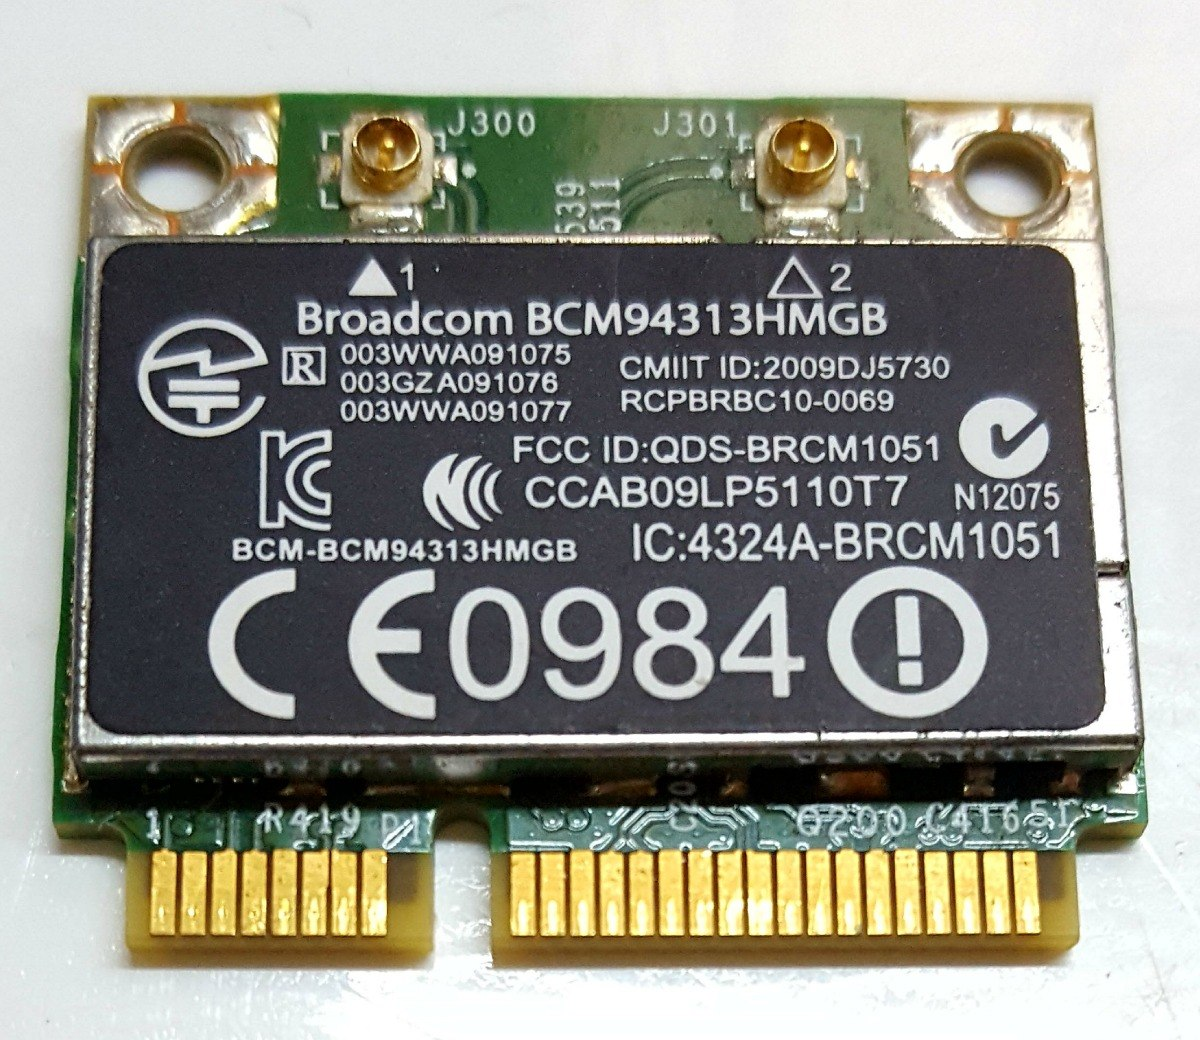 broadcom bcm94313hmgb driver windows 10